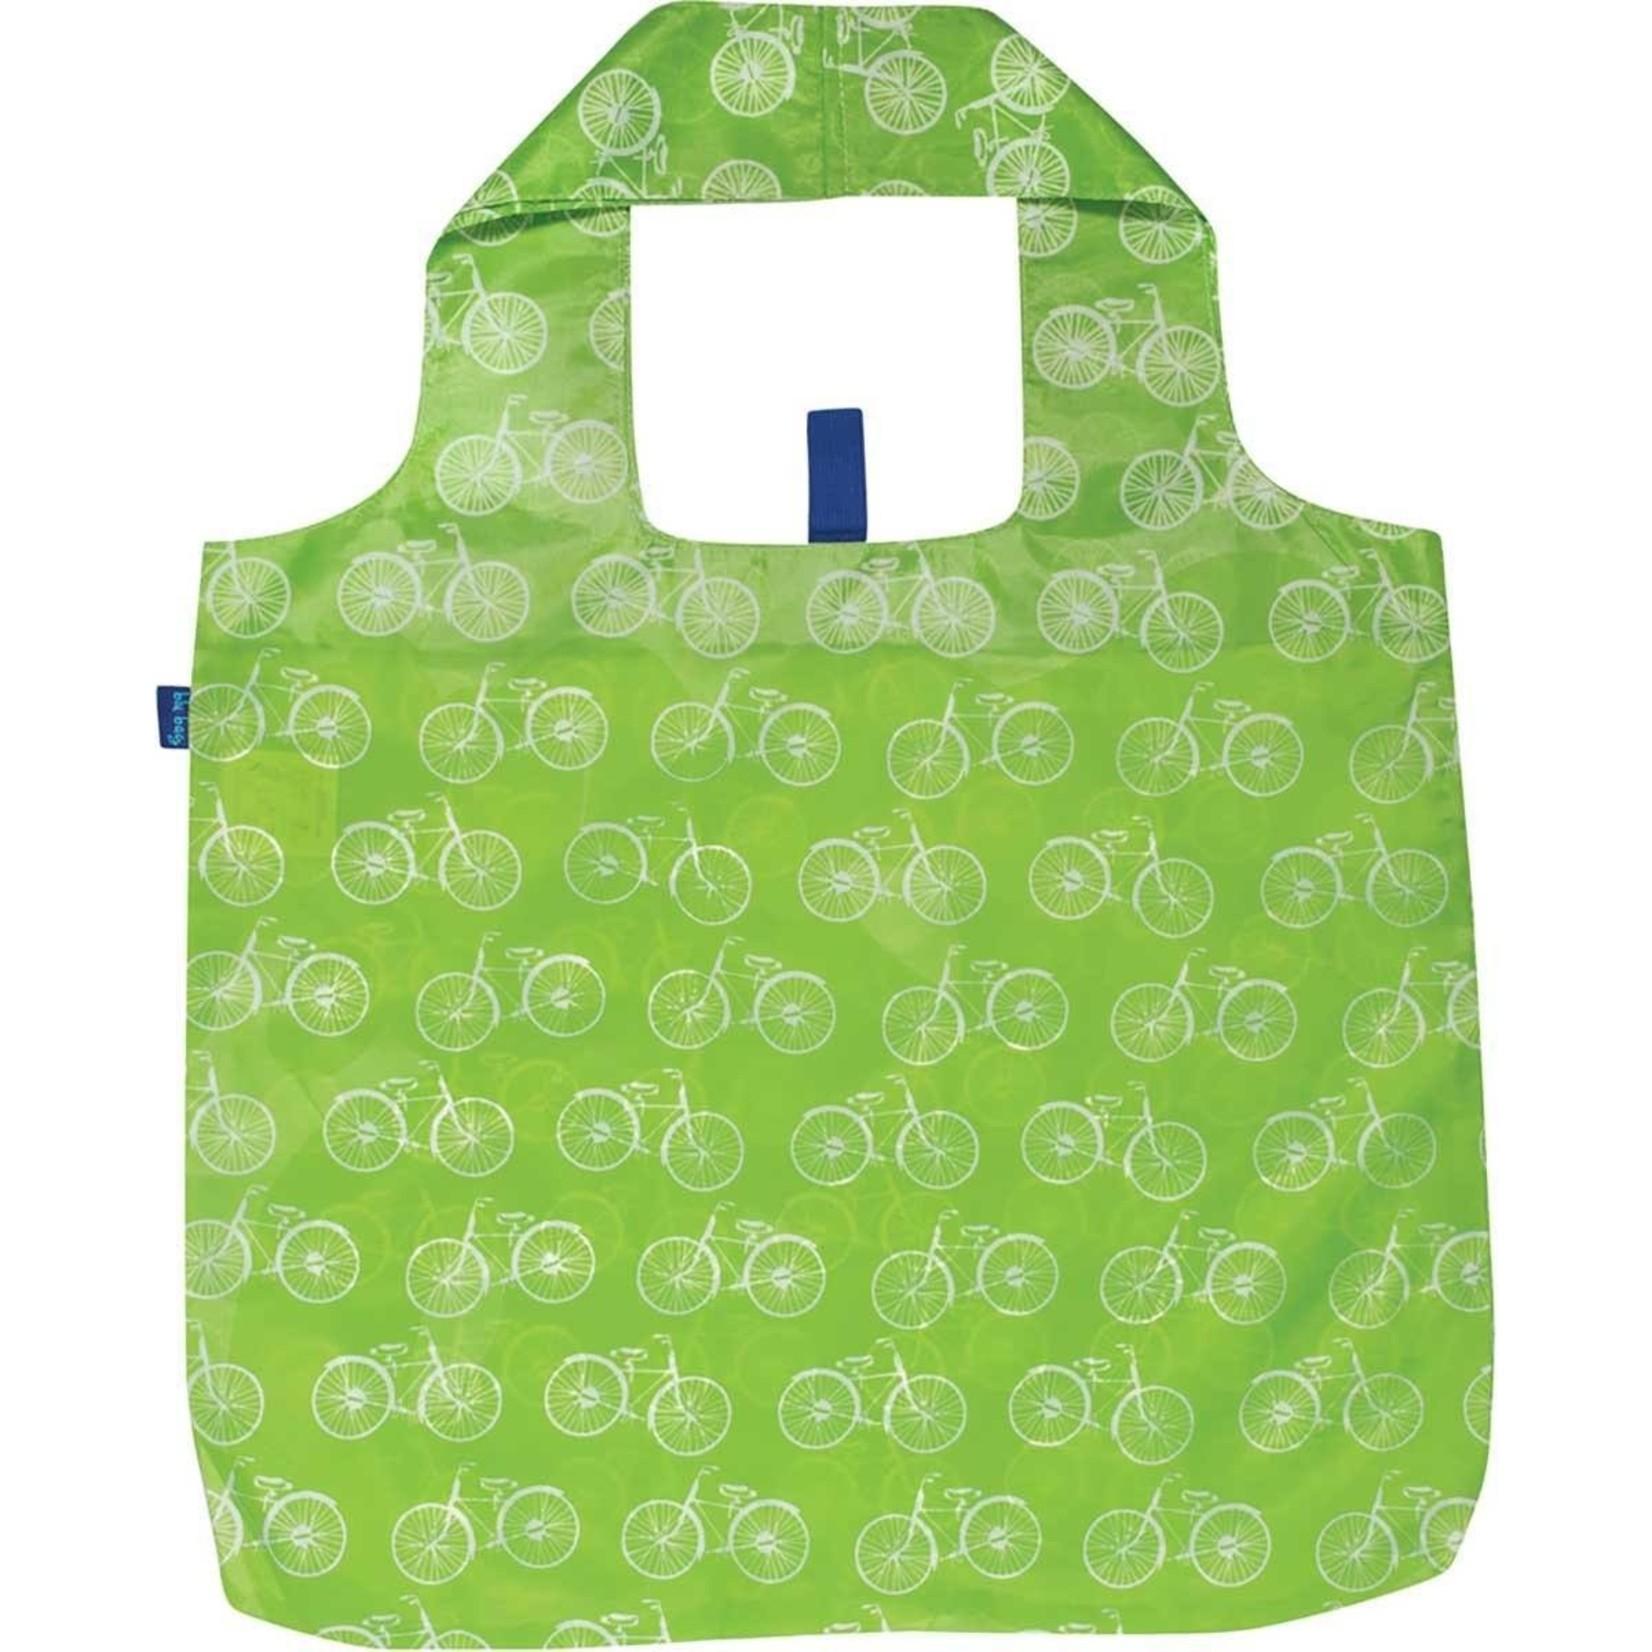 Rock Flower Paper 39-7880P Summer Bikes Lime Blu Bag